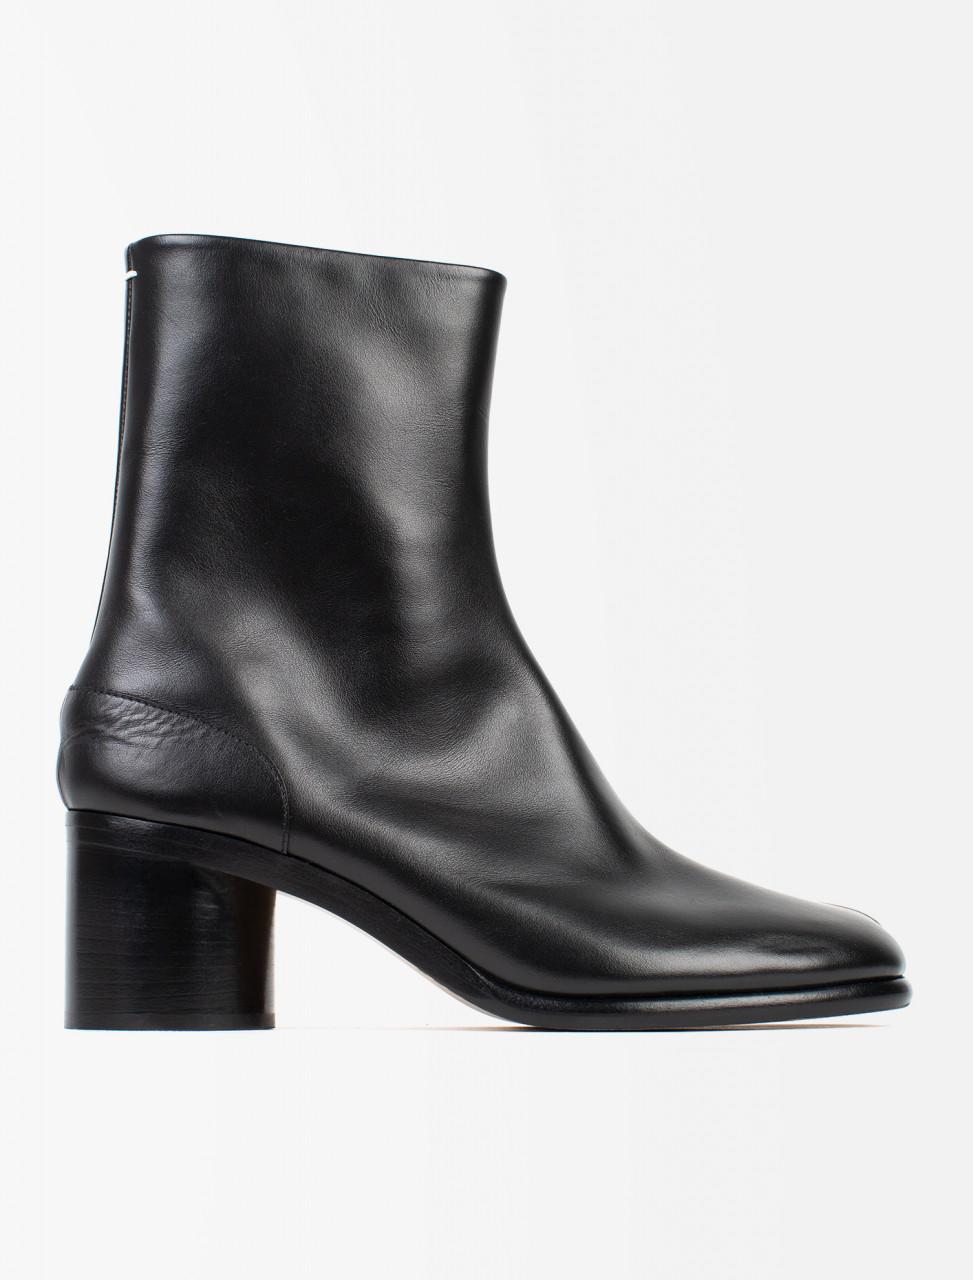 3a466ffc33b Maison Margiela Tabi Boot